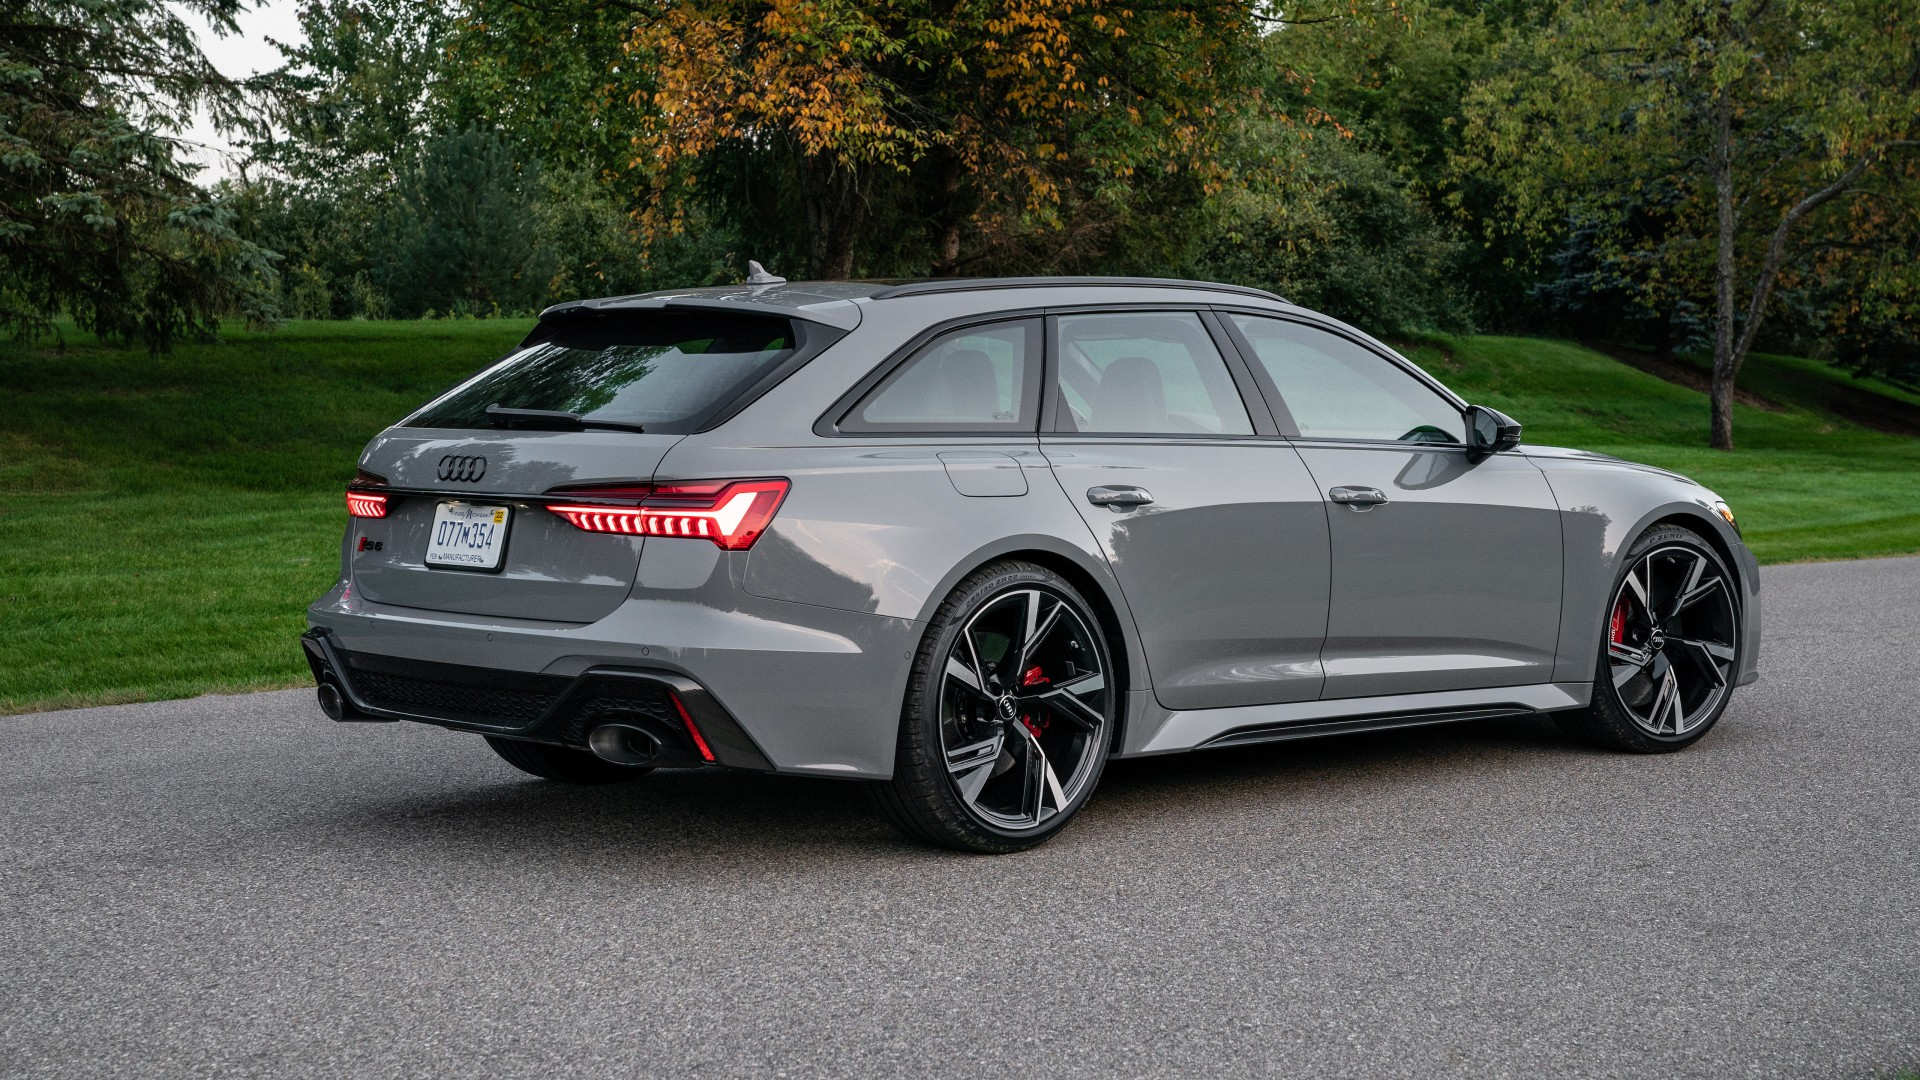 2021 Audi RS 6 Avant 5K 2 Wallpaper   HD Car Wallpapers ...